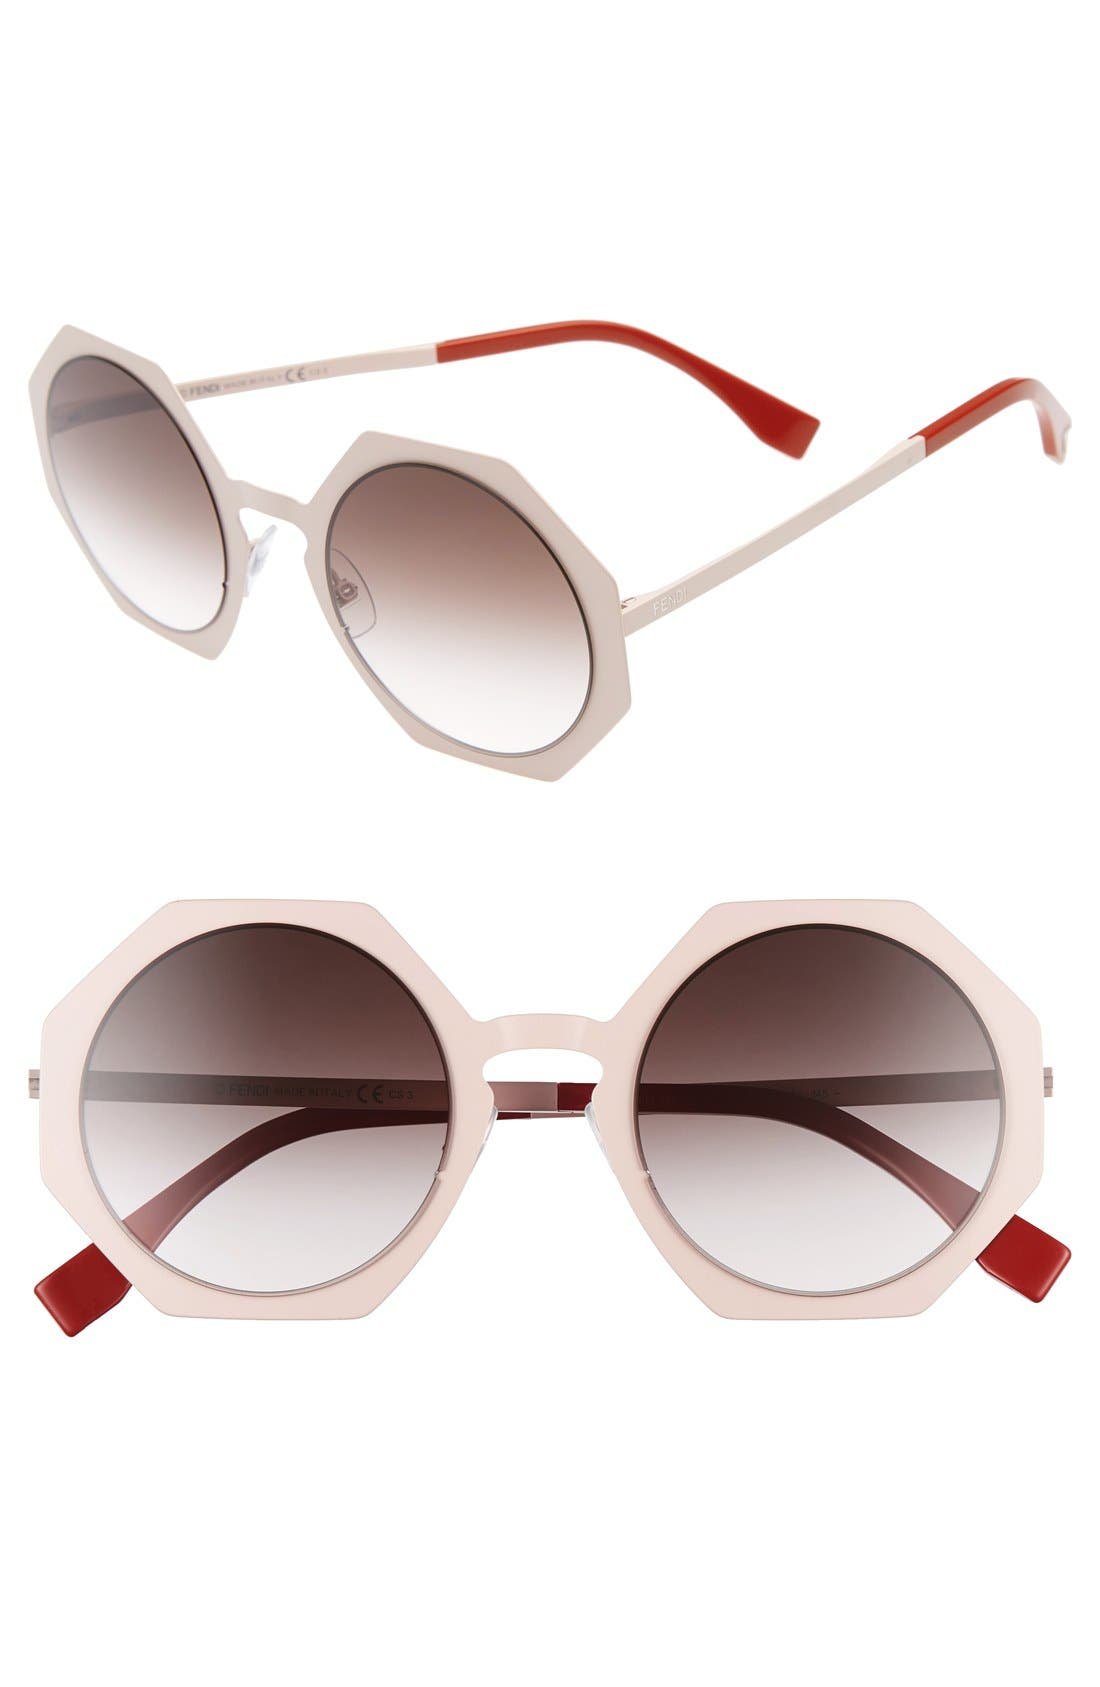 Main Image - Fendi 51mm Retro Octagon Sunglasses